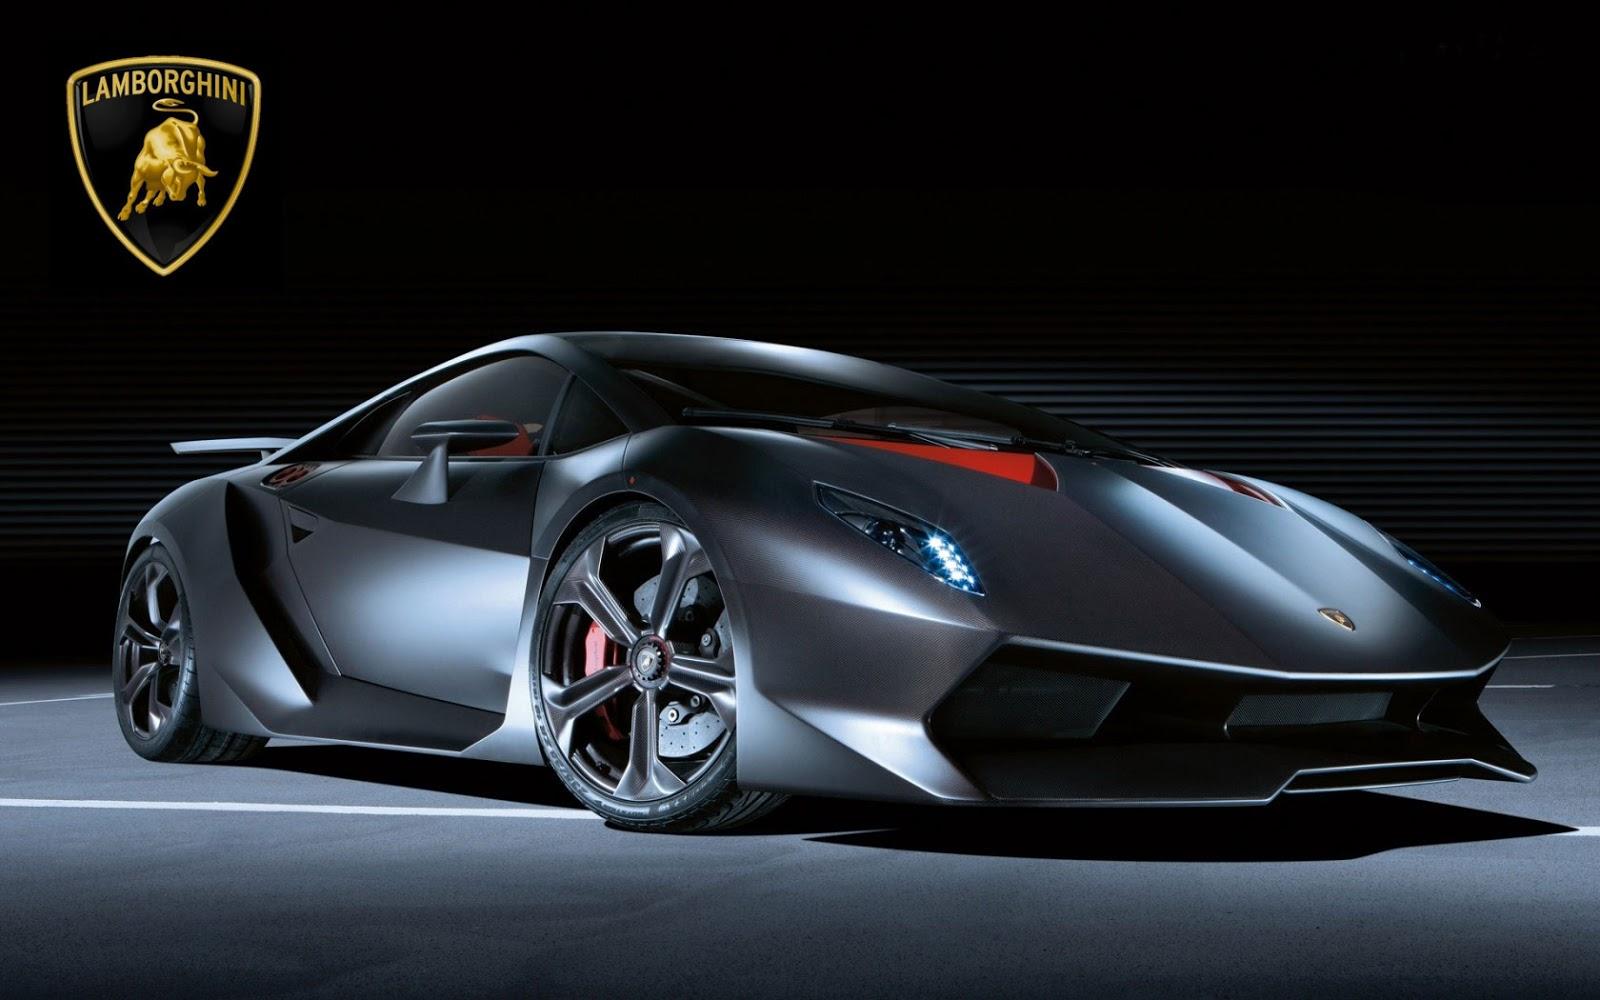 Black New Lamborghini Wallpaper Free HD